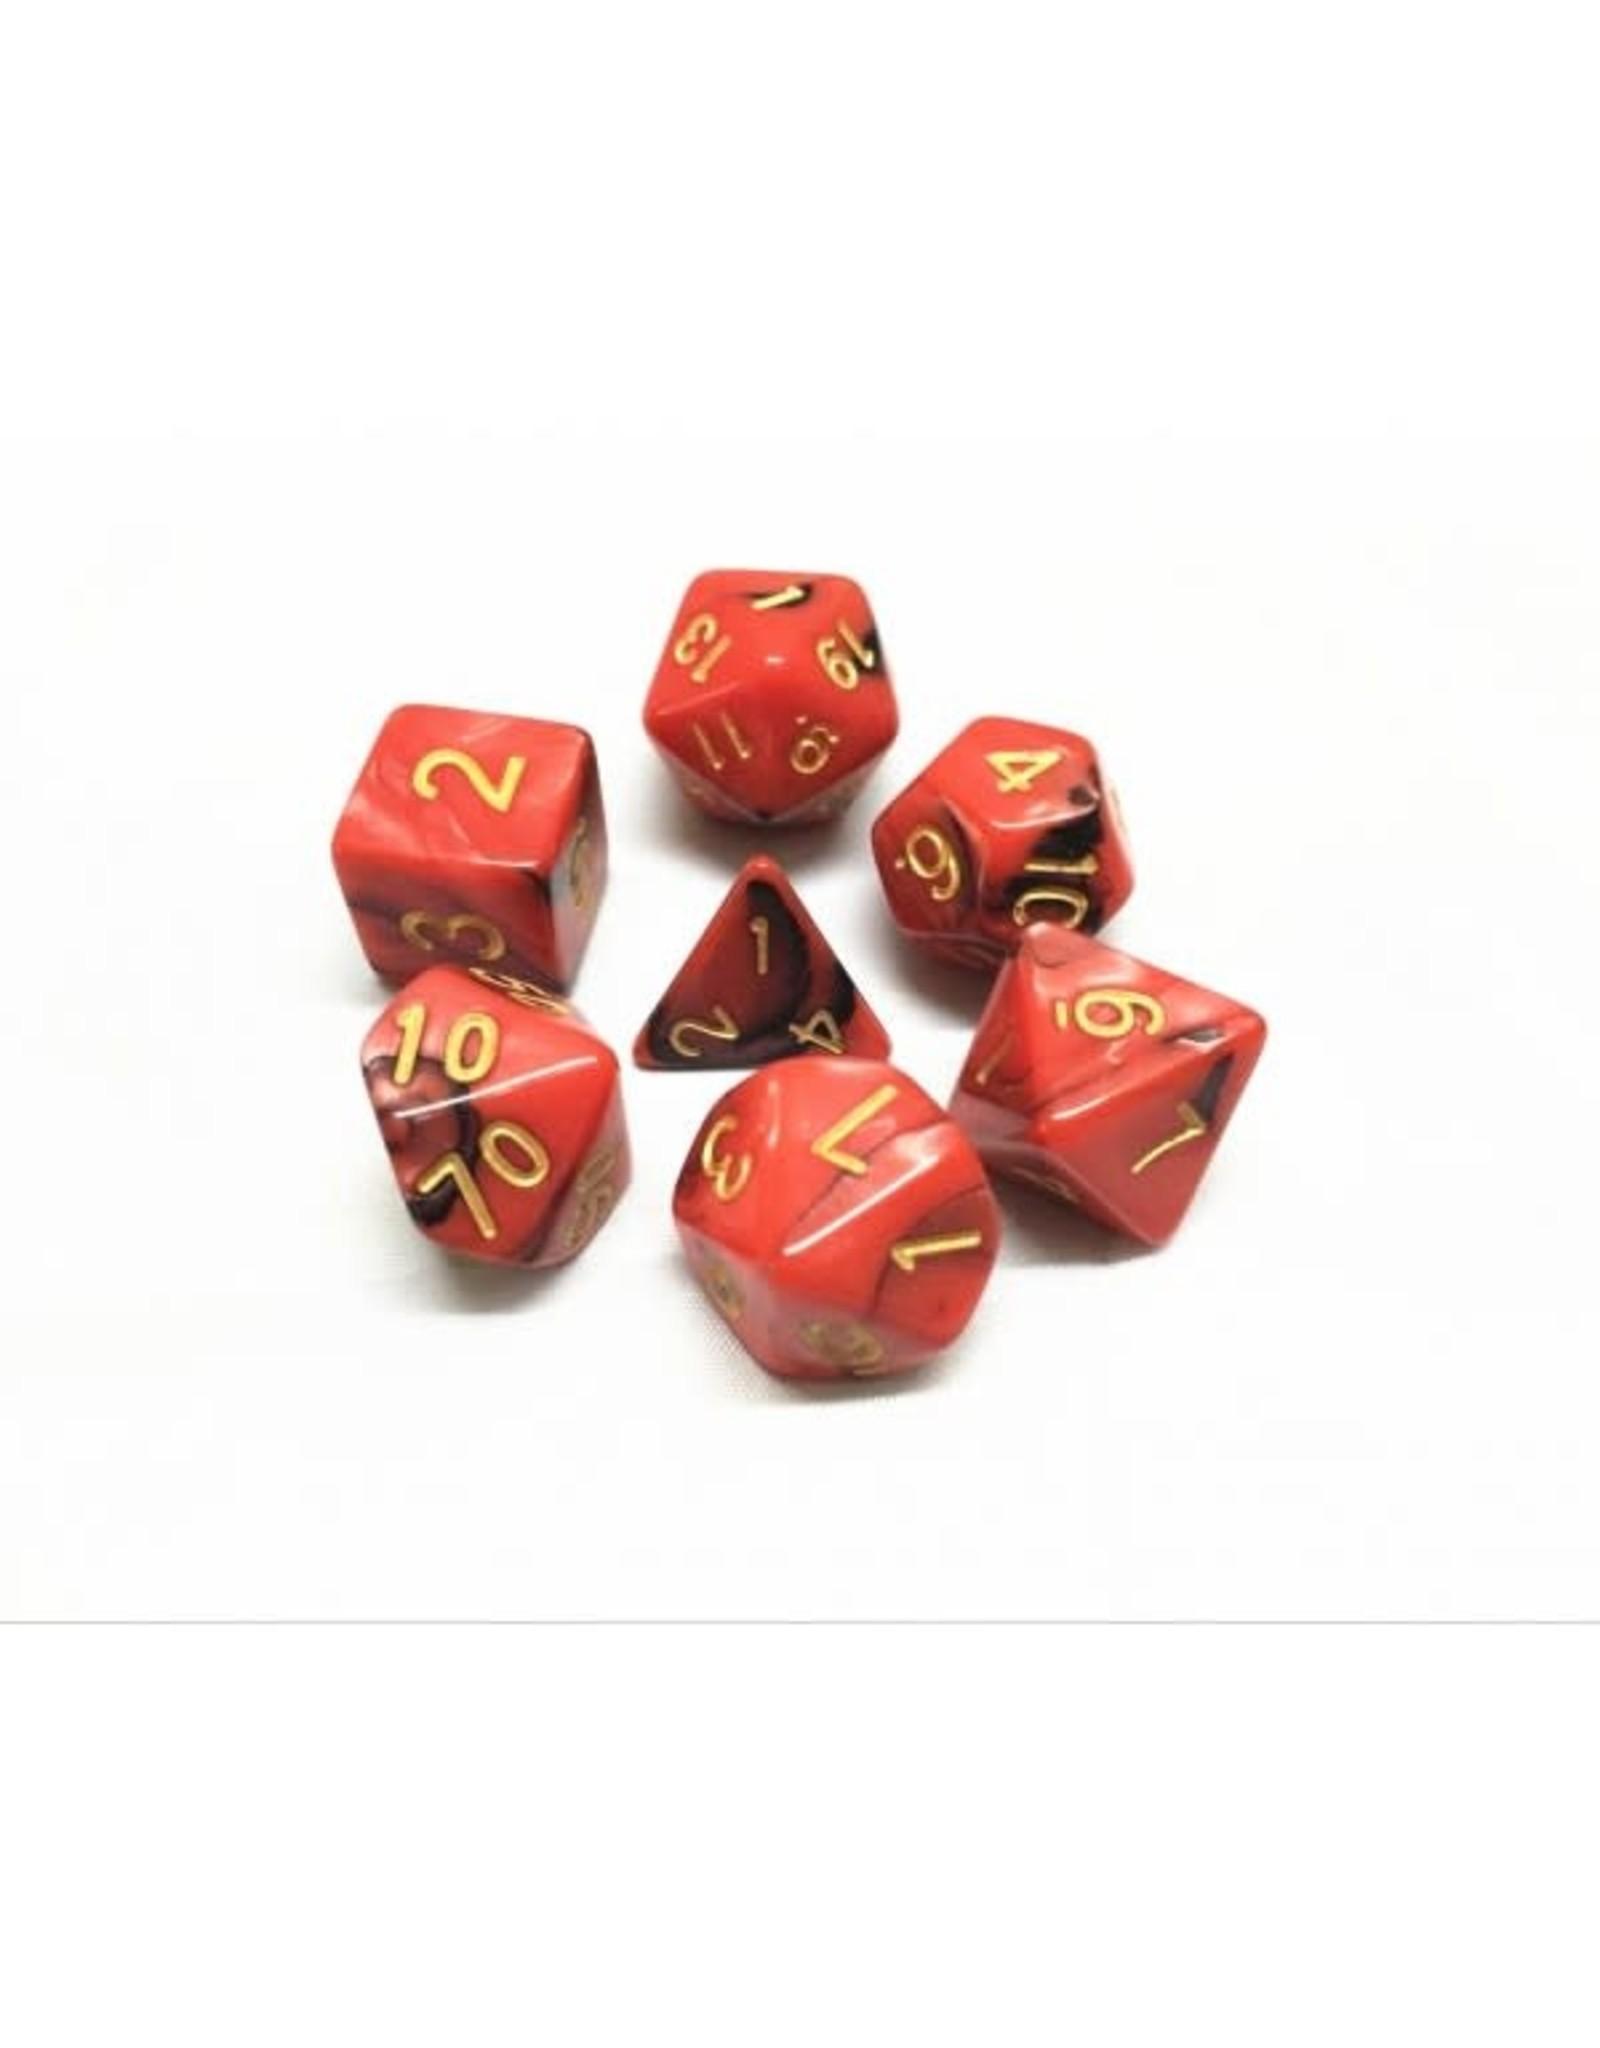 HD Dice, LLC. Blend Red-Black Poly Dice (7)